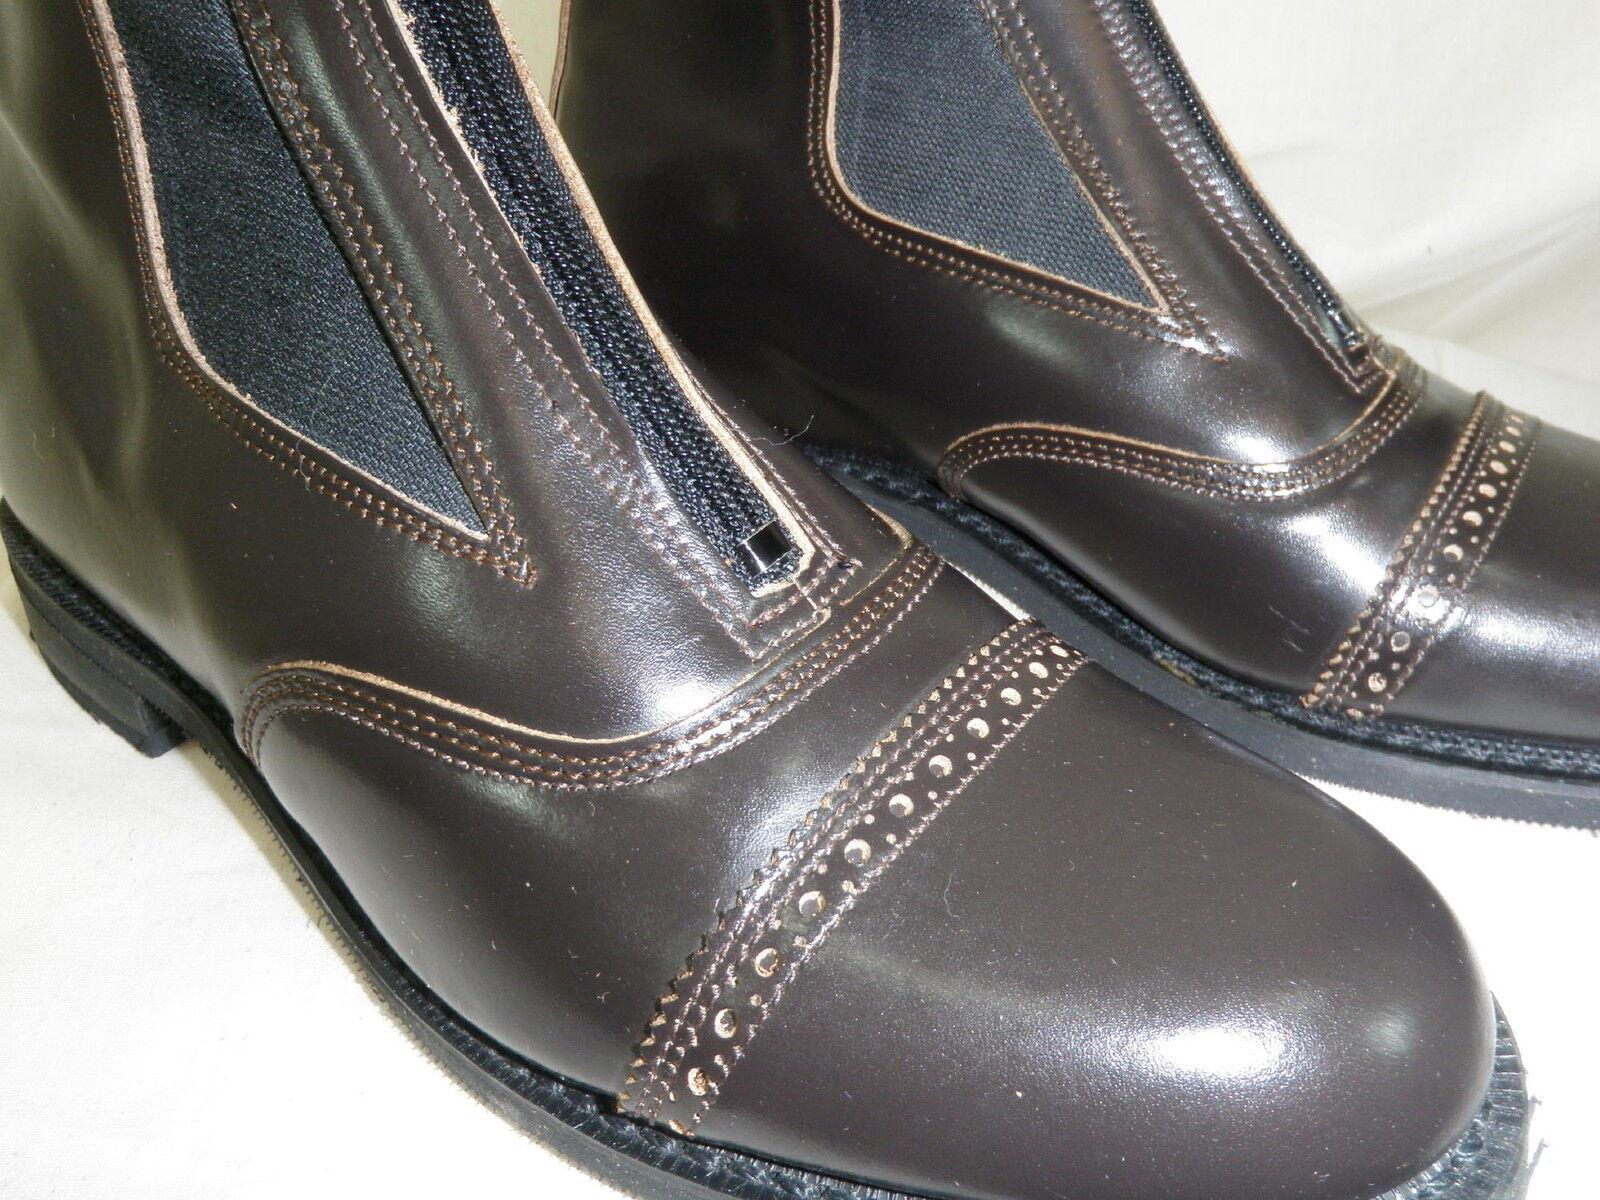 Reed Hill Dark Marronee Leather Zipper Jod stivali Ladies Dimensione 712 C  Made in USA